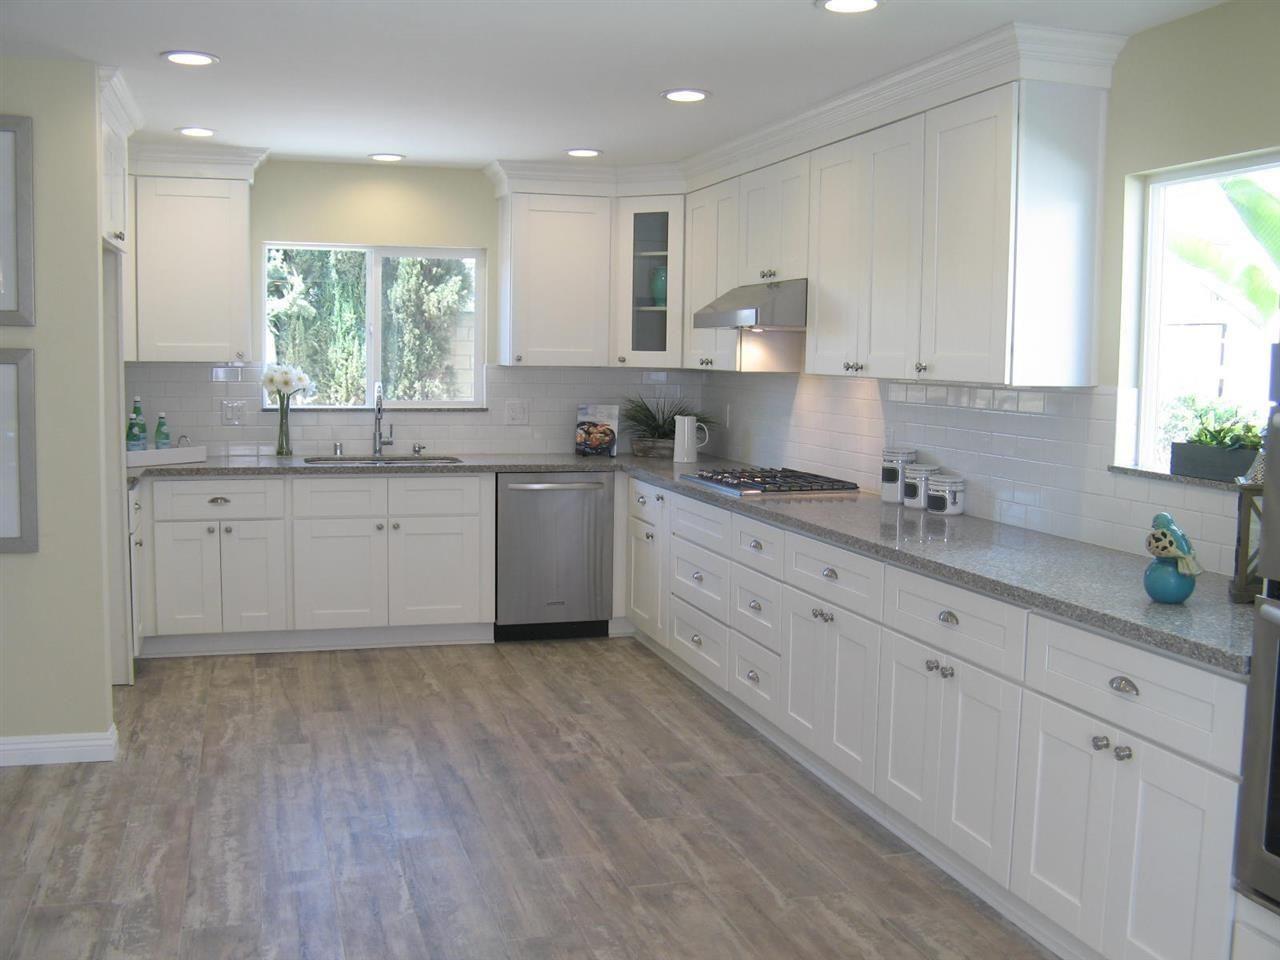 Main Photo: CORONADO CAYS House for sale : 3 bedrooms : 76 Half Moon Bend